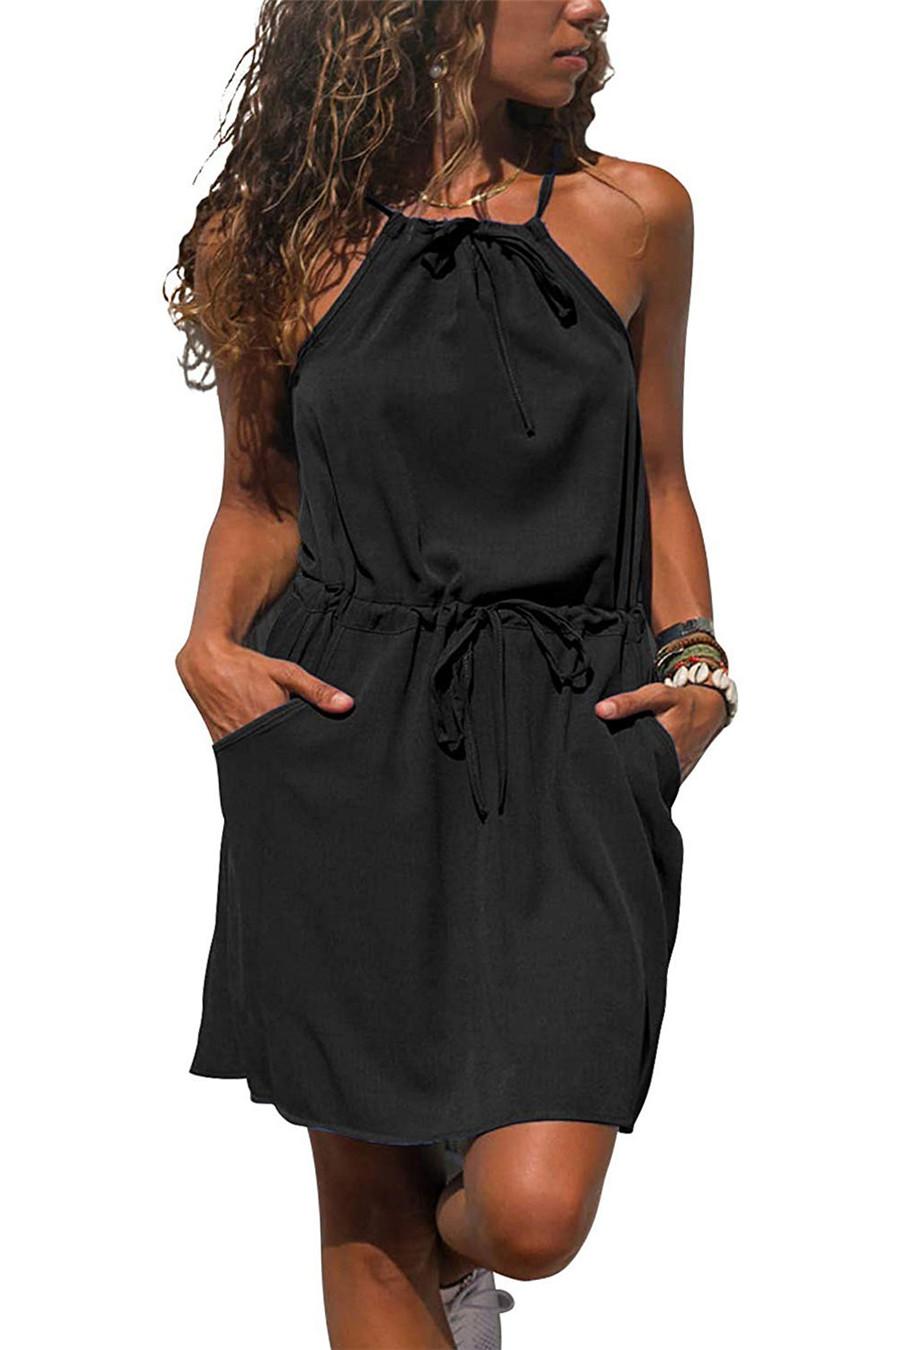 Gladiolus Chiffon Women Summer Dress Spaghetti Strap Floral Print Pocket Sexy Bohemian Beach Dress 2019 Short Ladies Dresses (41)